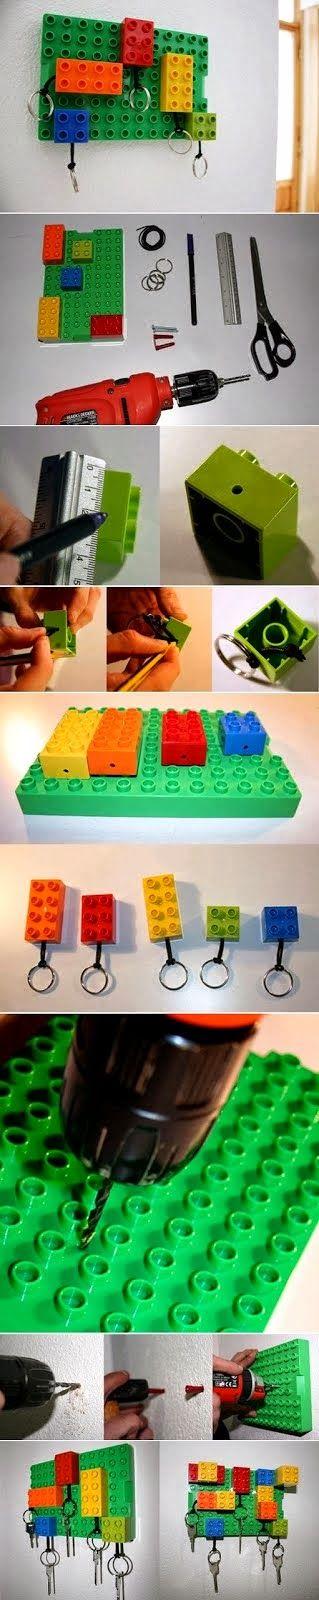 Diy Lego Key Hanger Crafts Pinterest Diy And